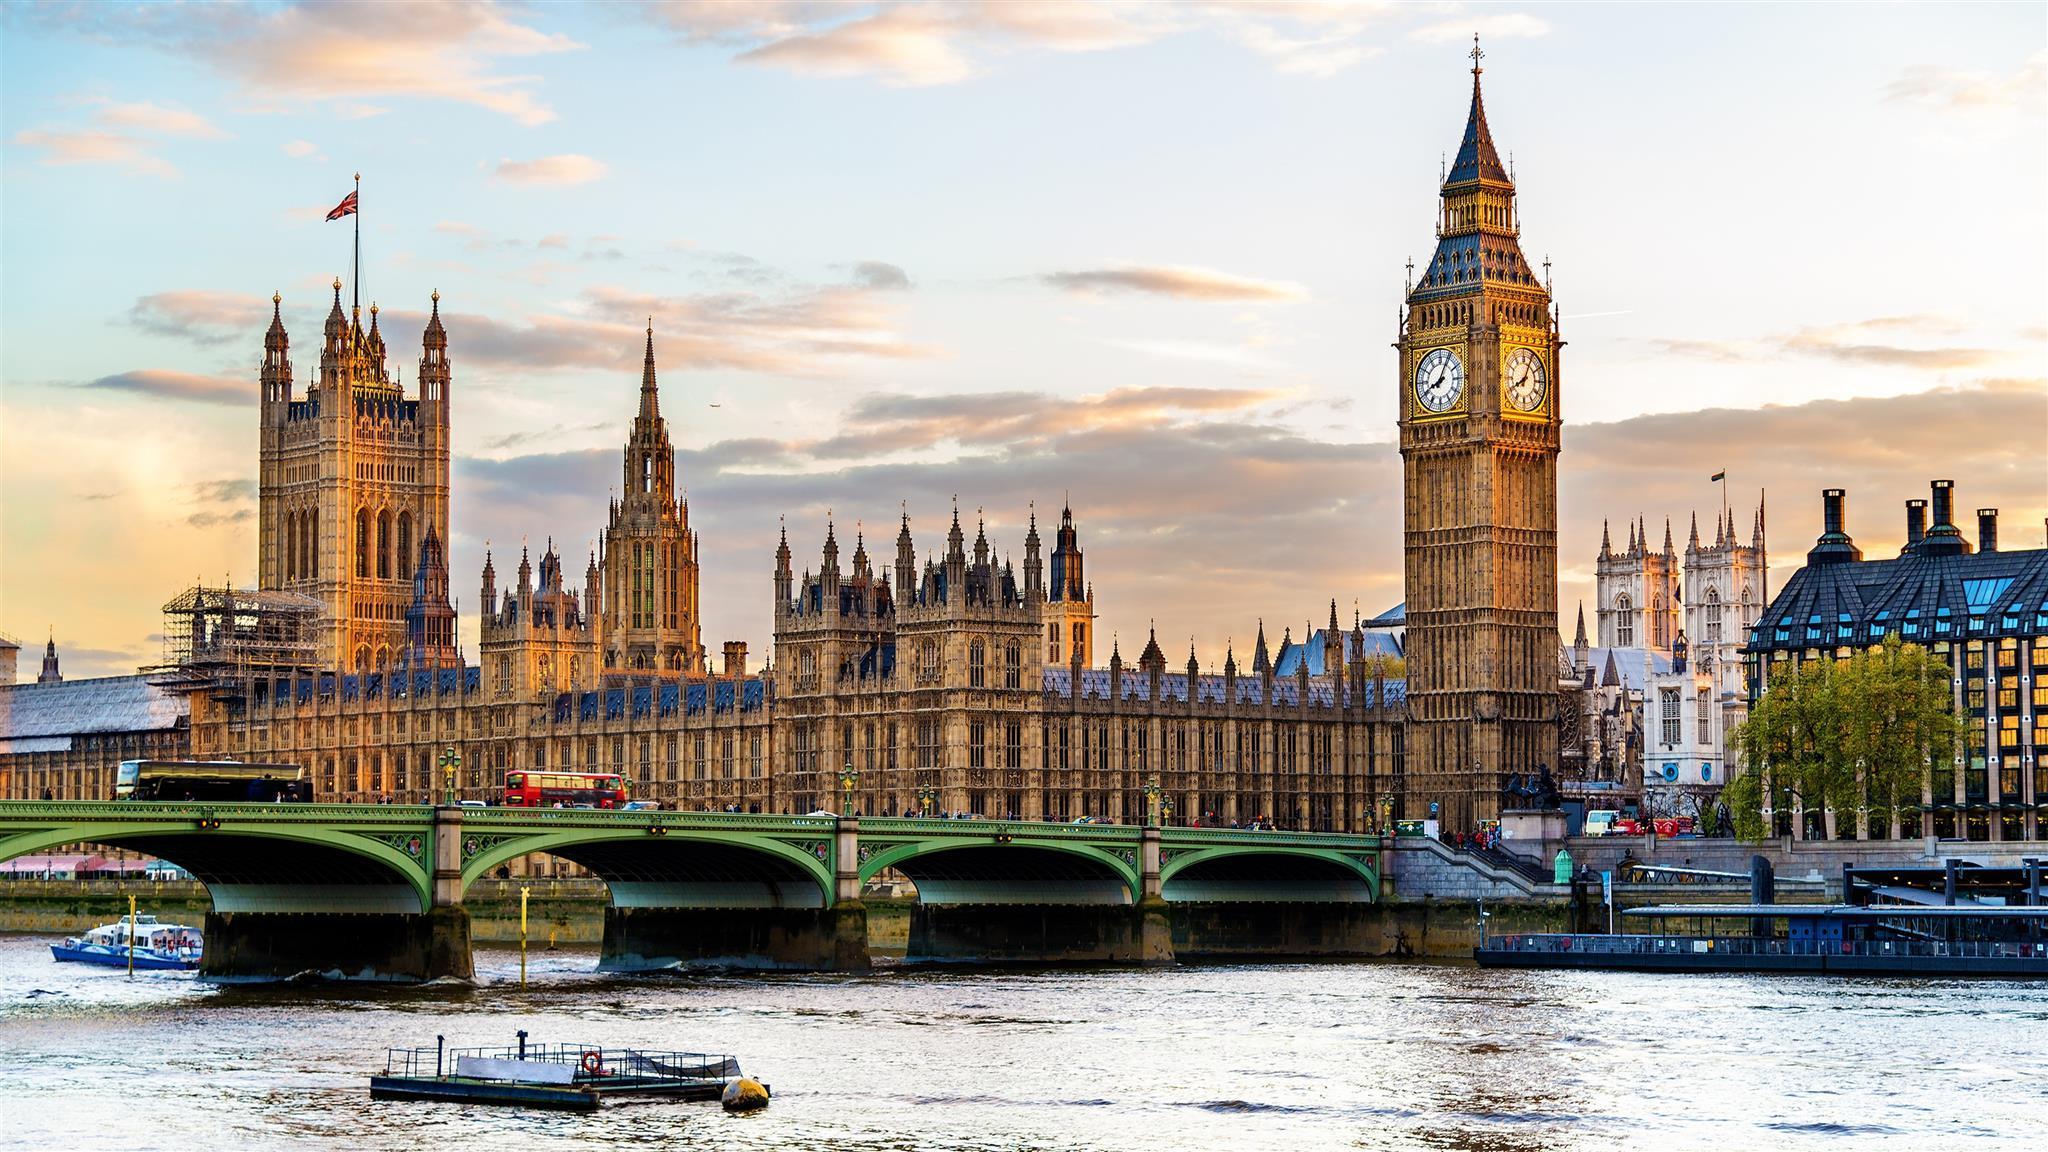 Hook up a Londra